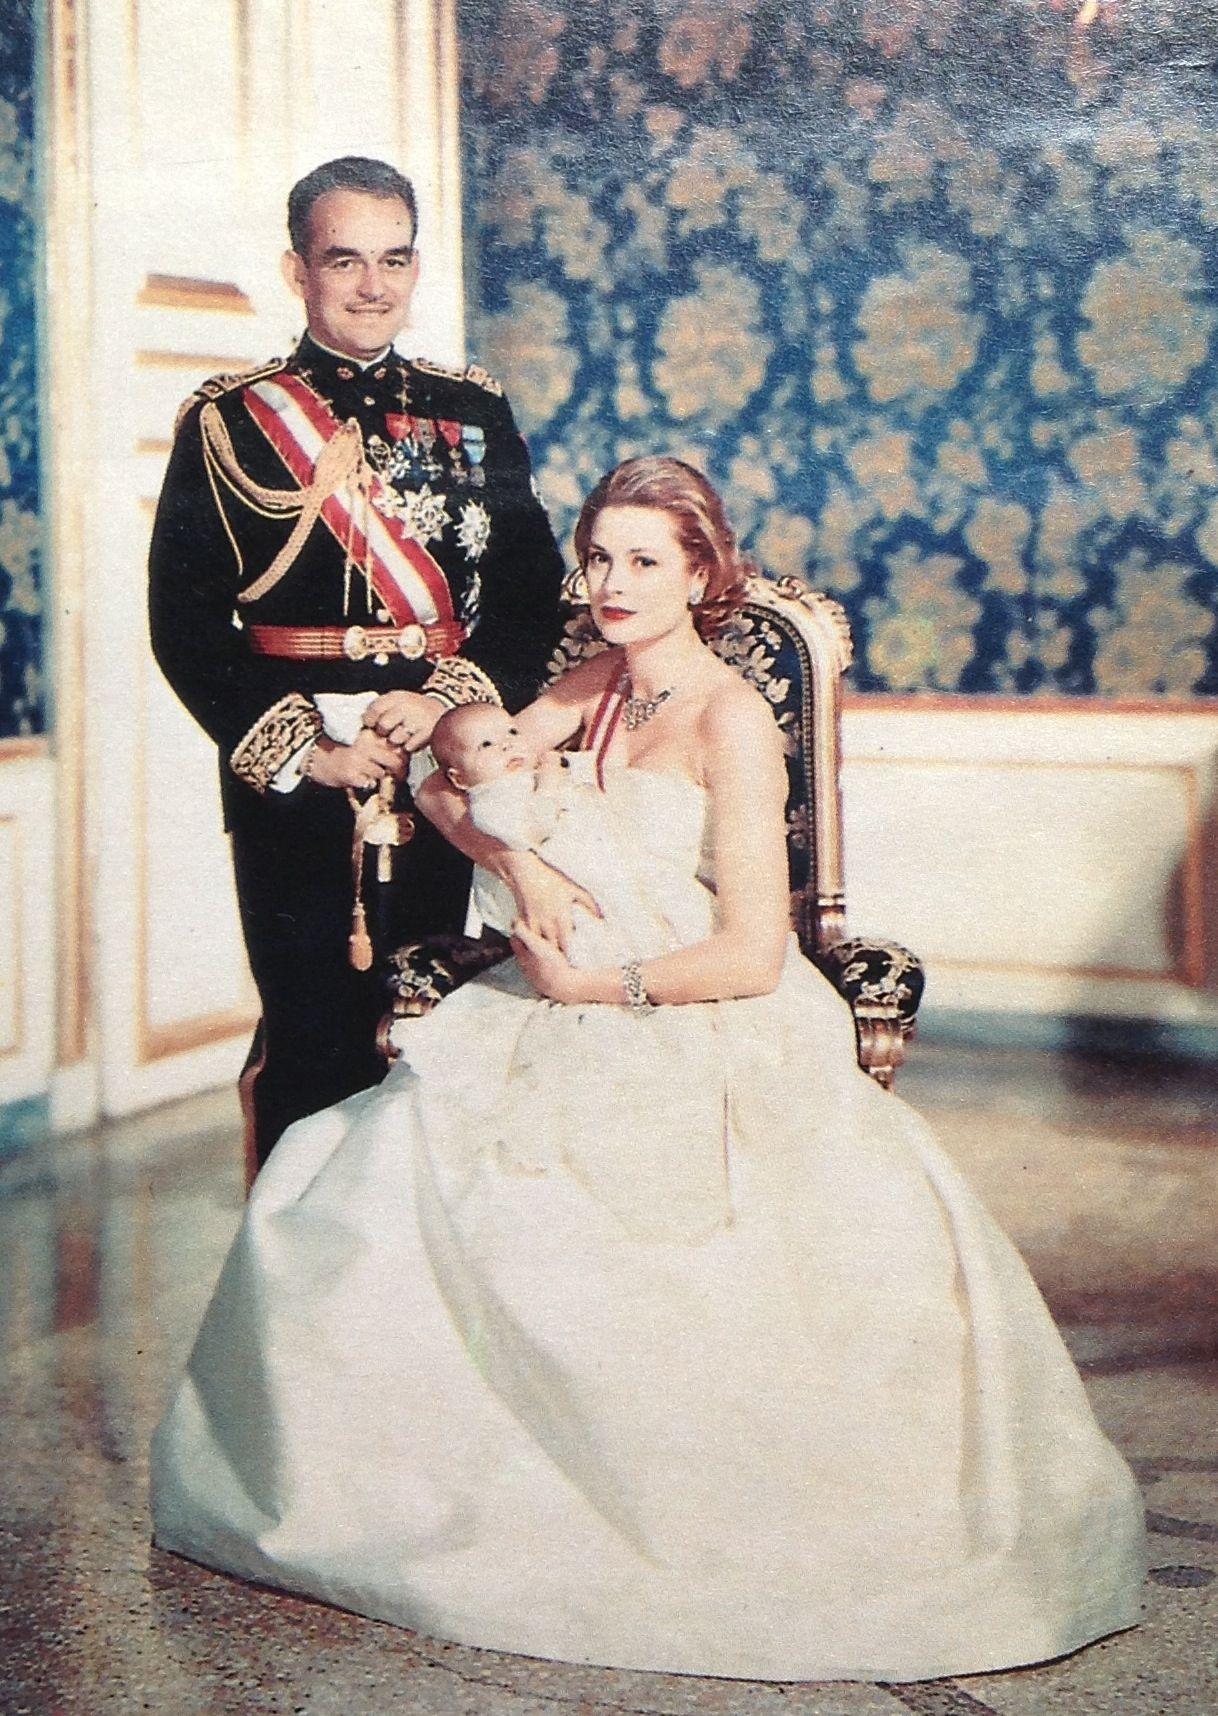 Monaco Royal Family 1957 Princess Grace Kelly Grace Kelly Wedding Grace Kelly [ 1716 x 1218 Pixel ]